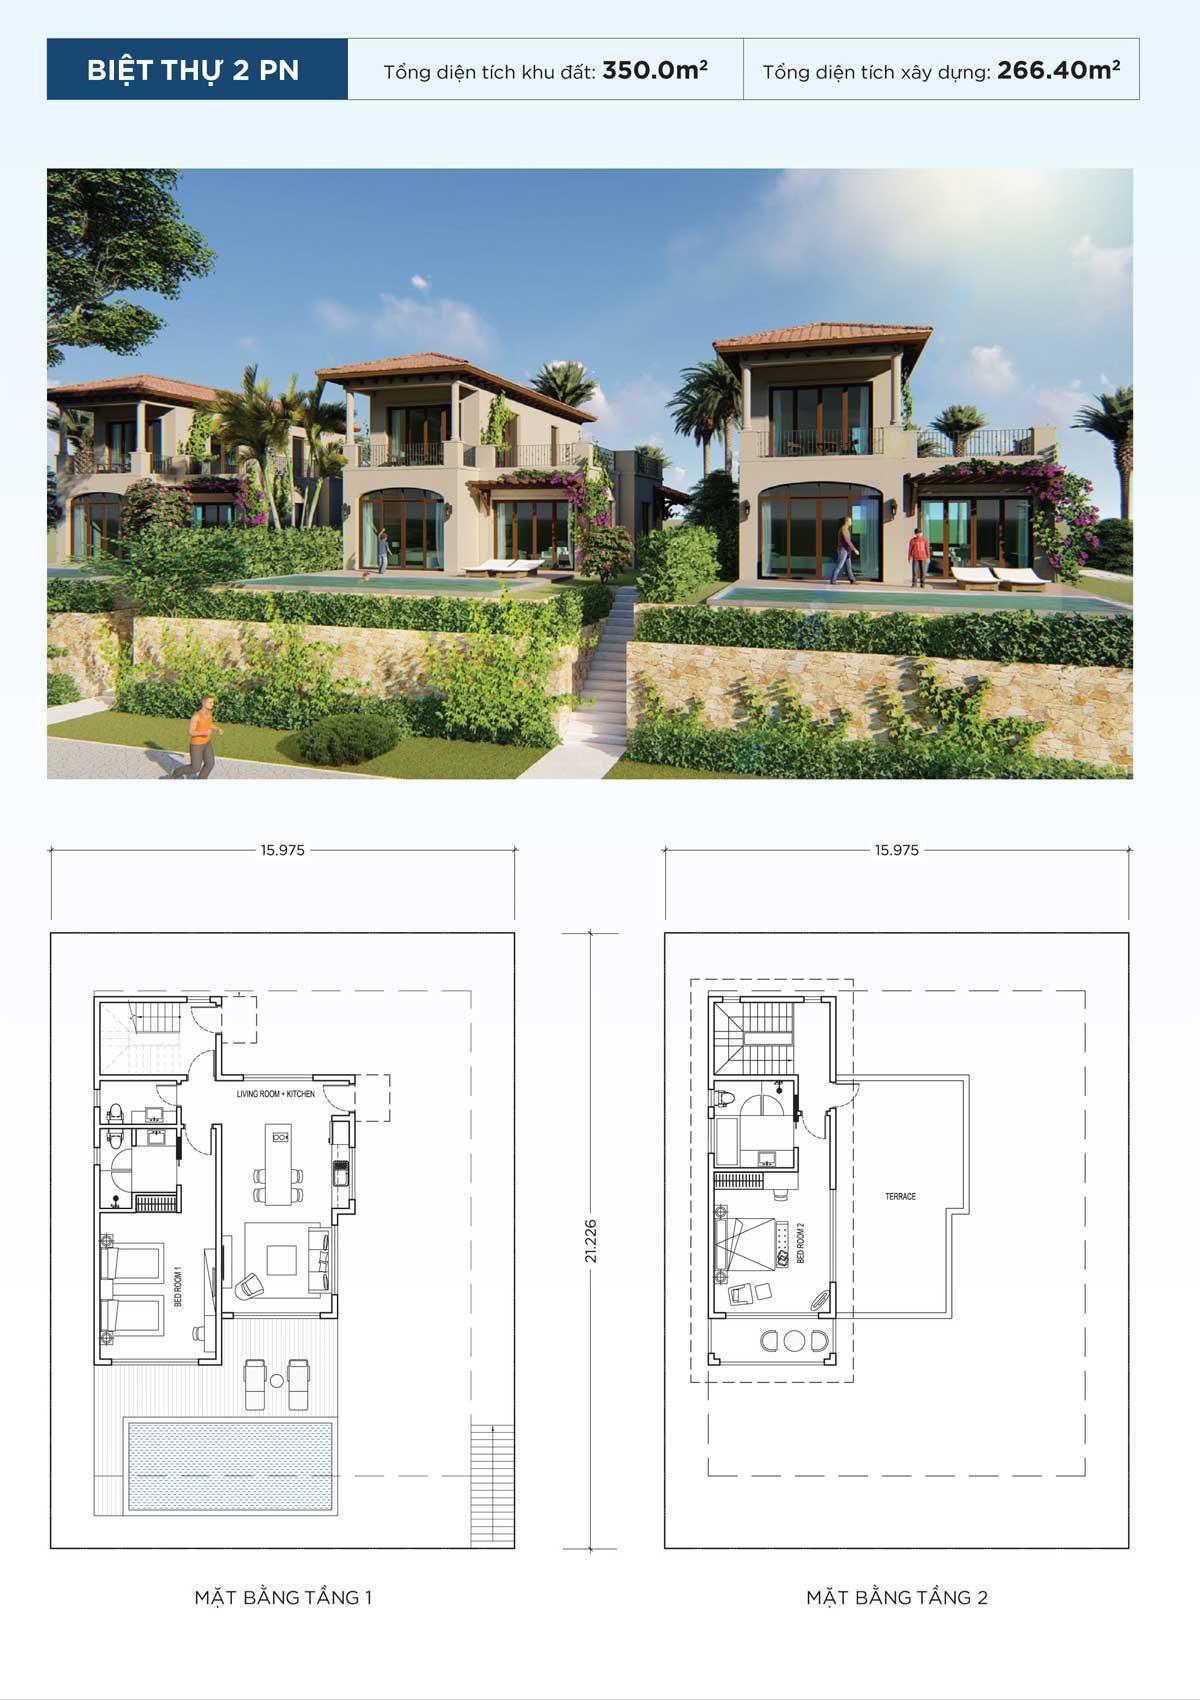 thiet-ke-biet-thu-2pn-du-an-nova-beach-cam-ranh-resort-villas